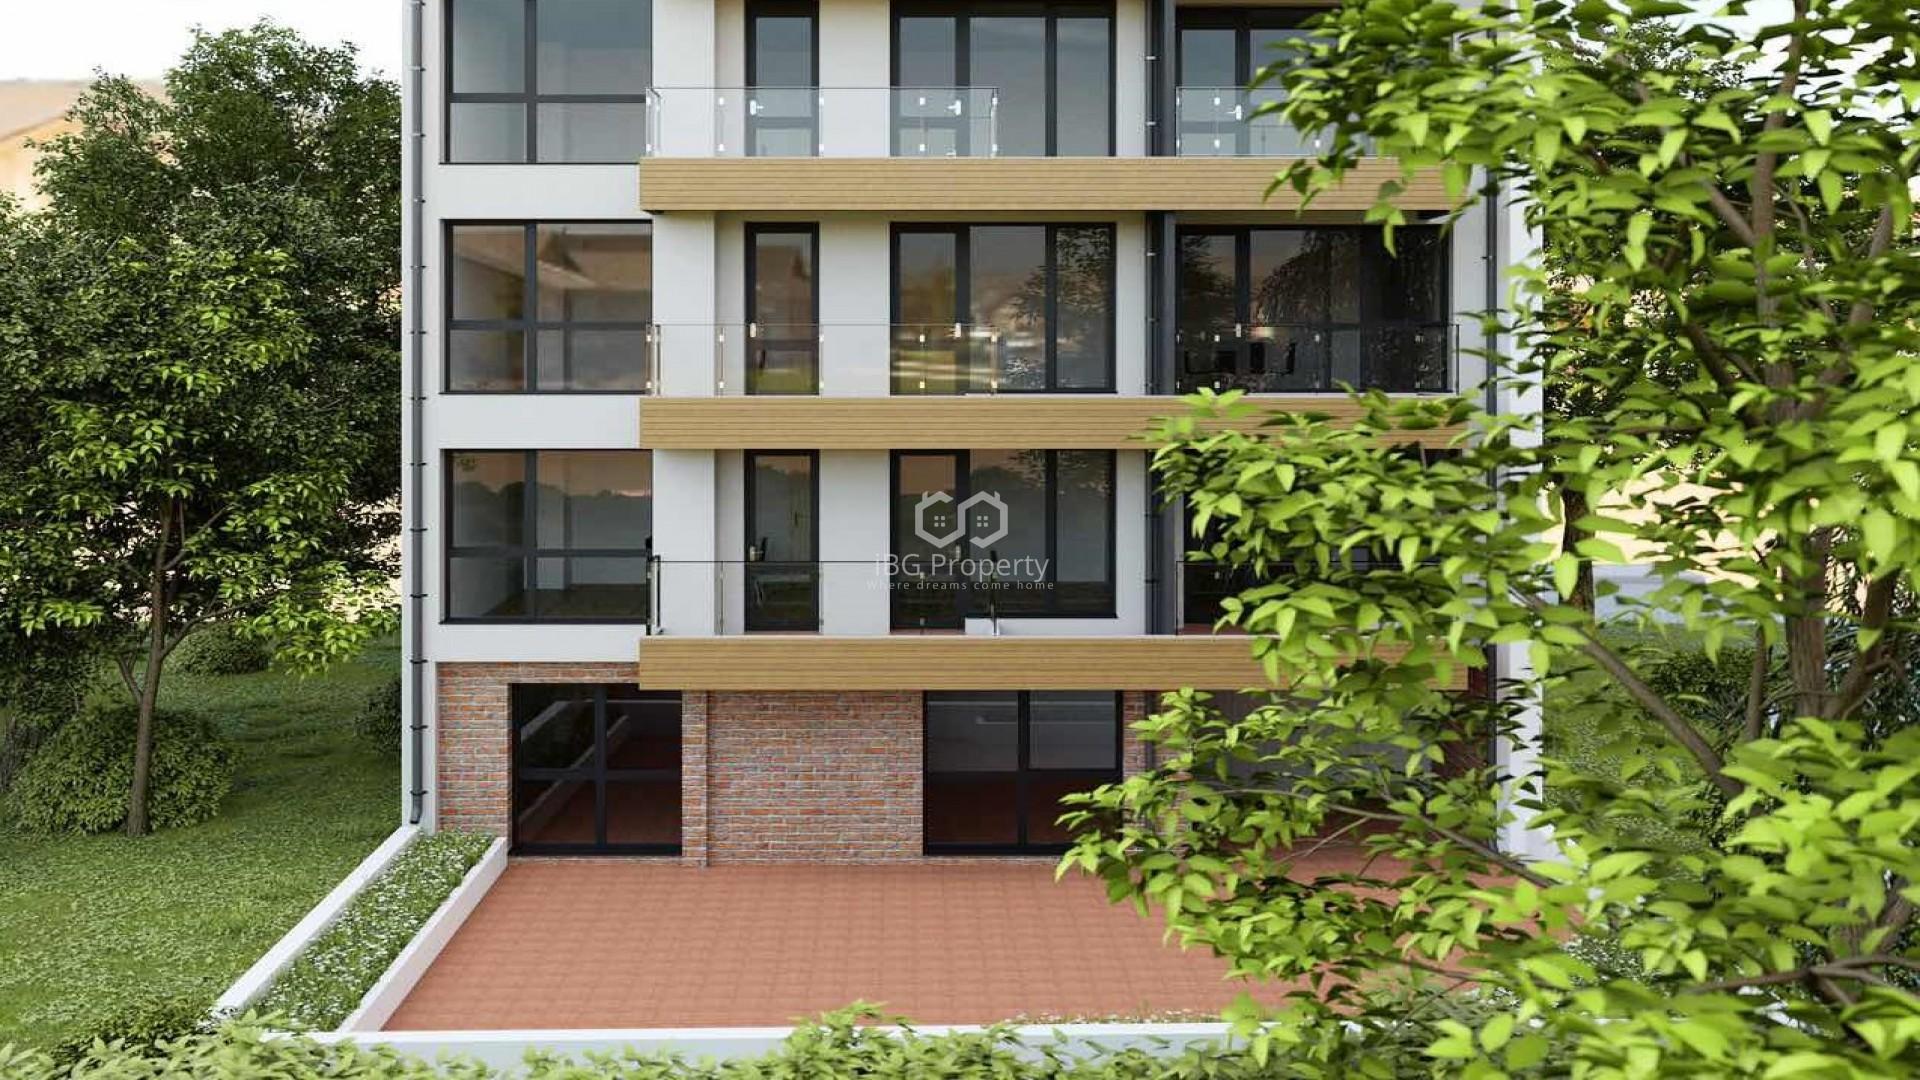 Тристаен апартамент Лятно кино Тракия Варна 117 m2